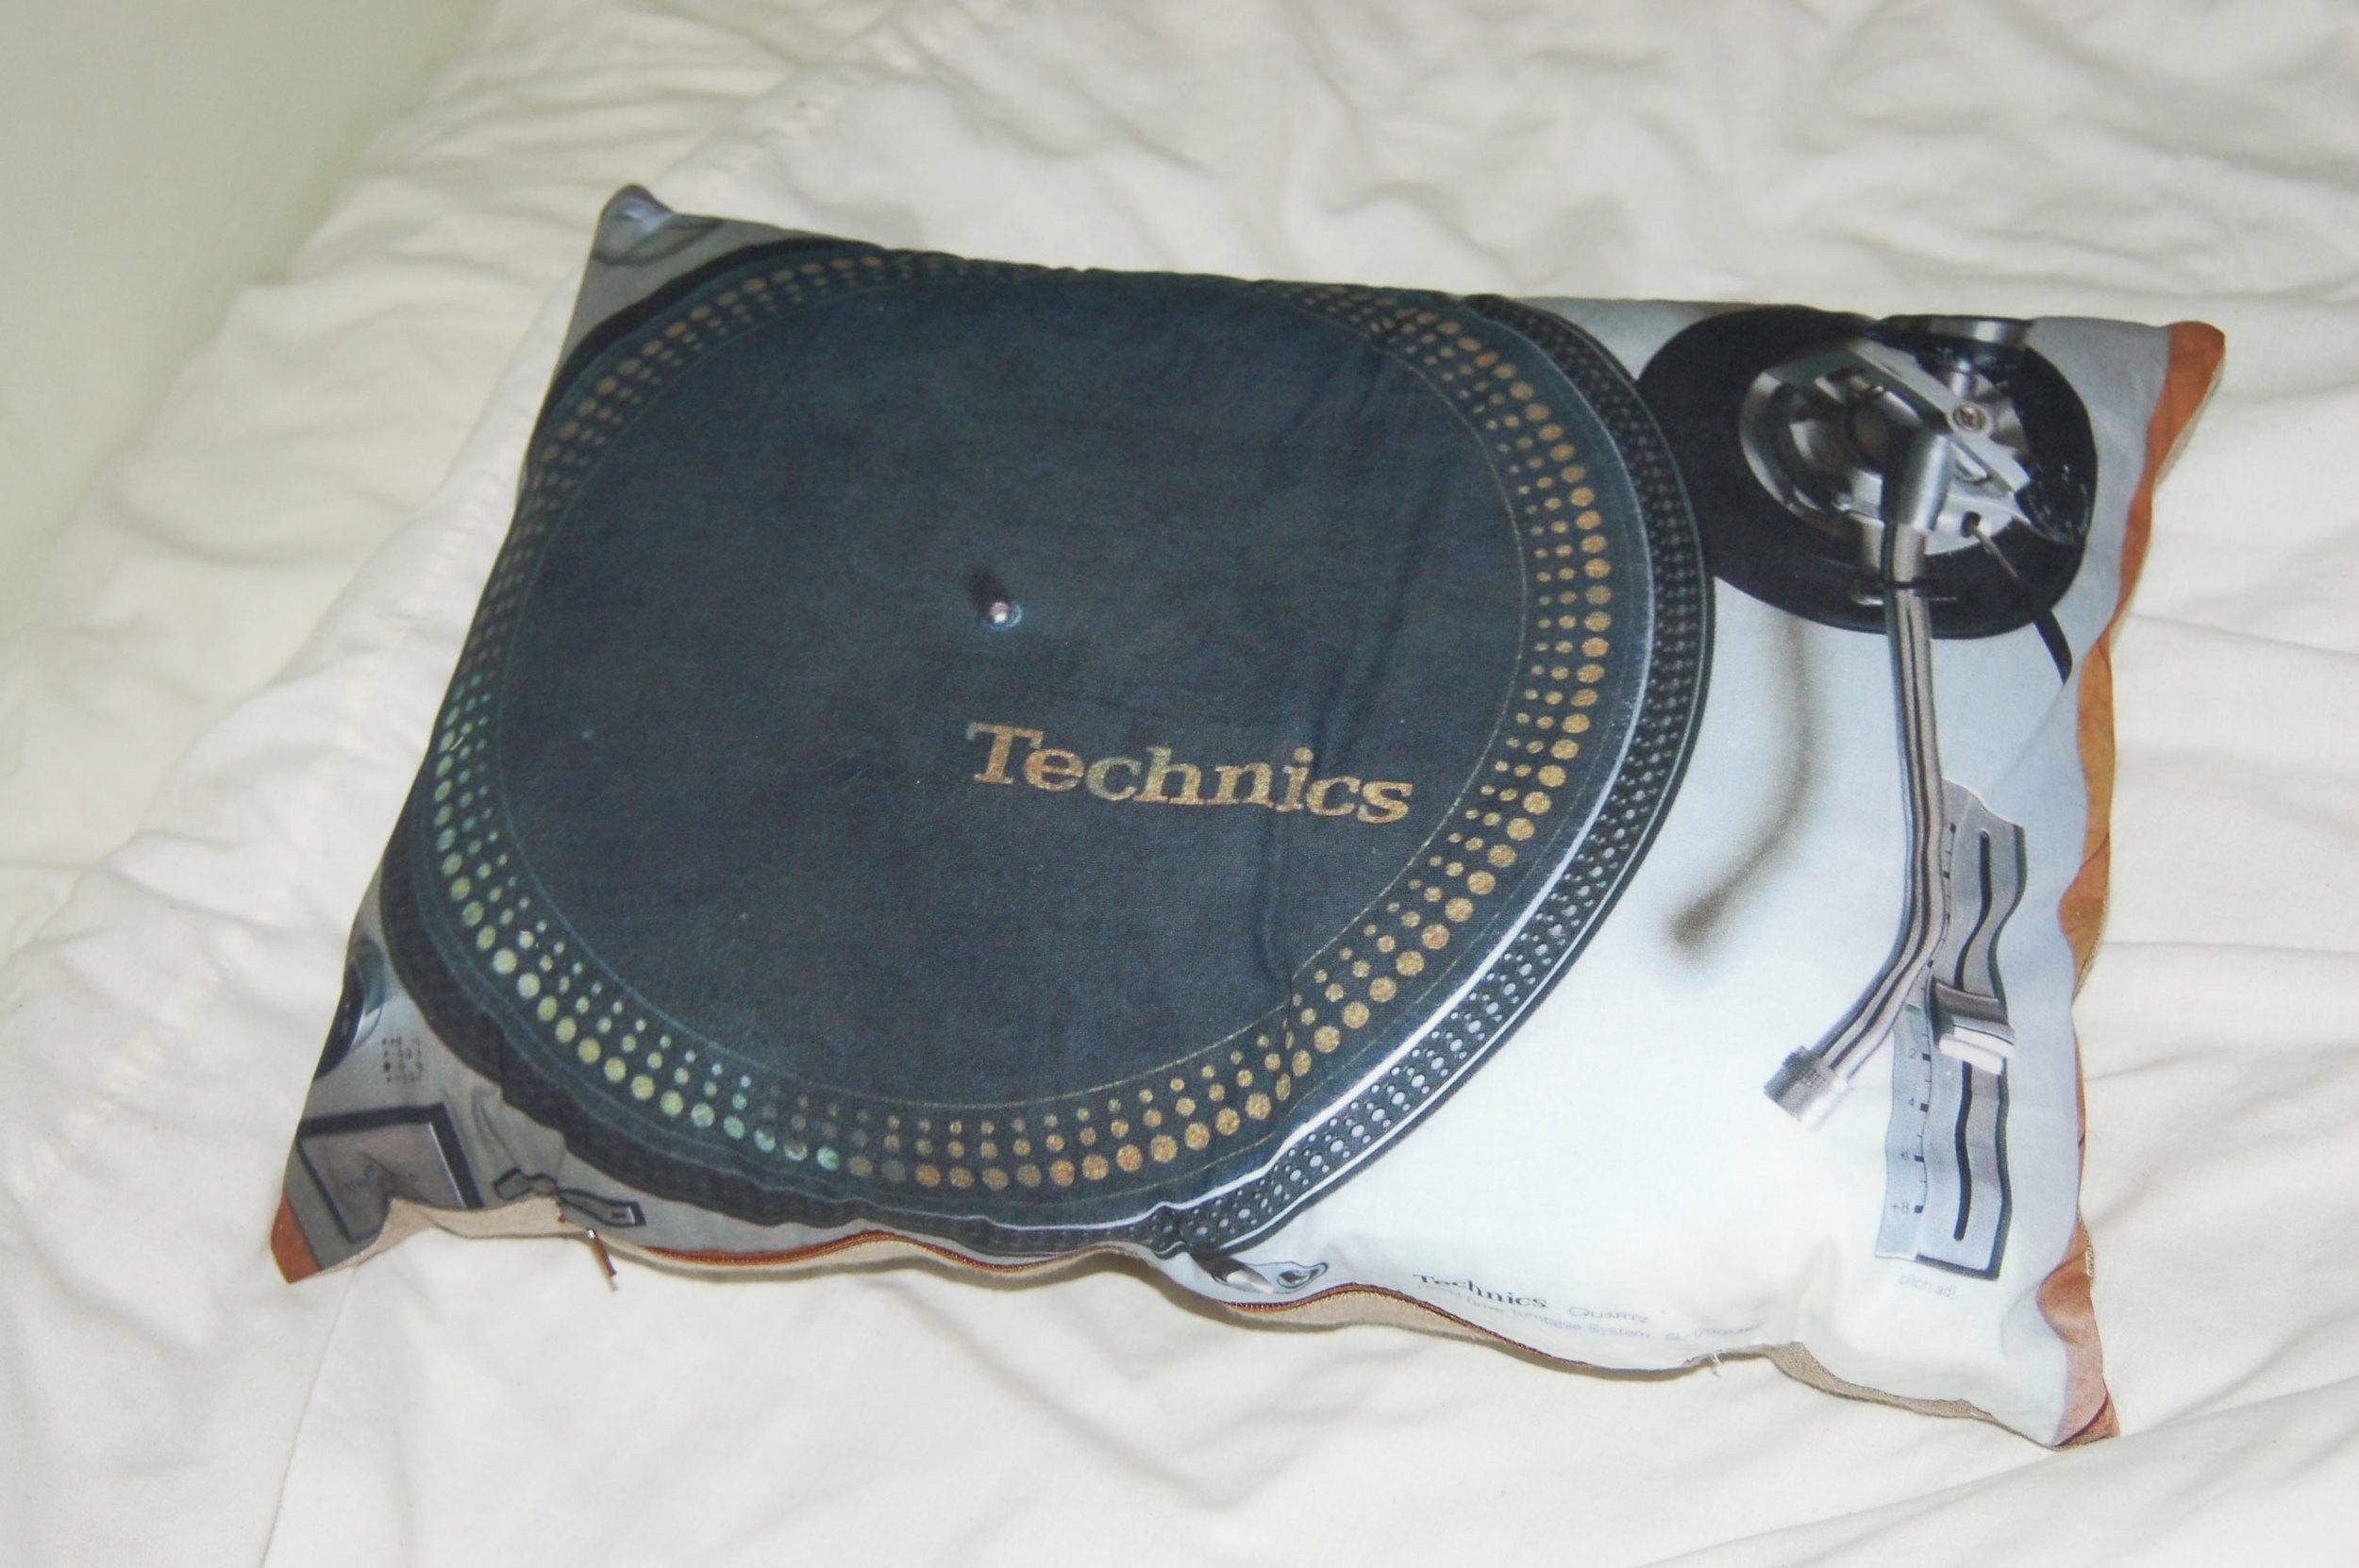 Technics.jpg